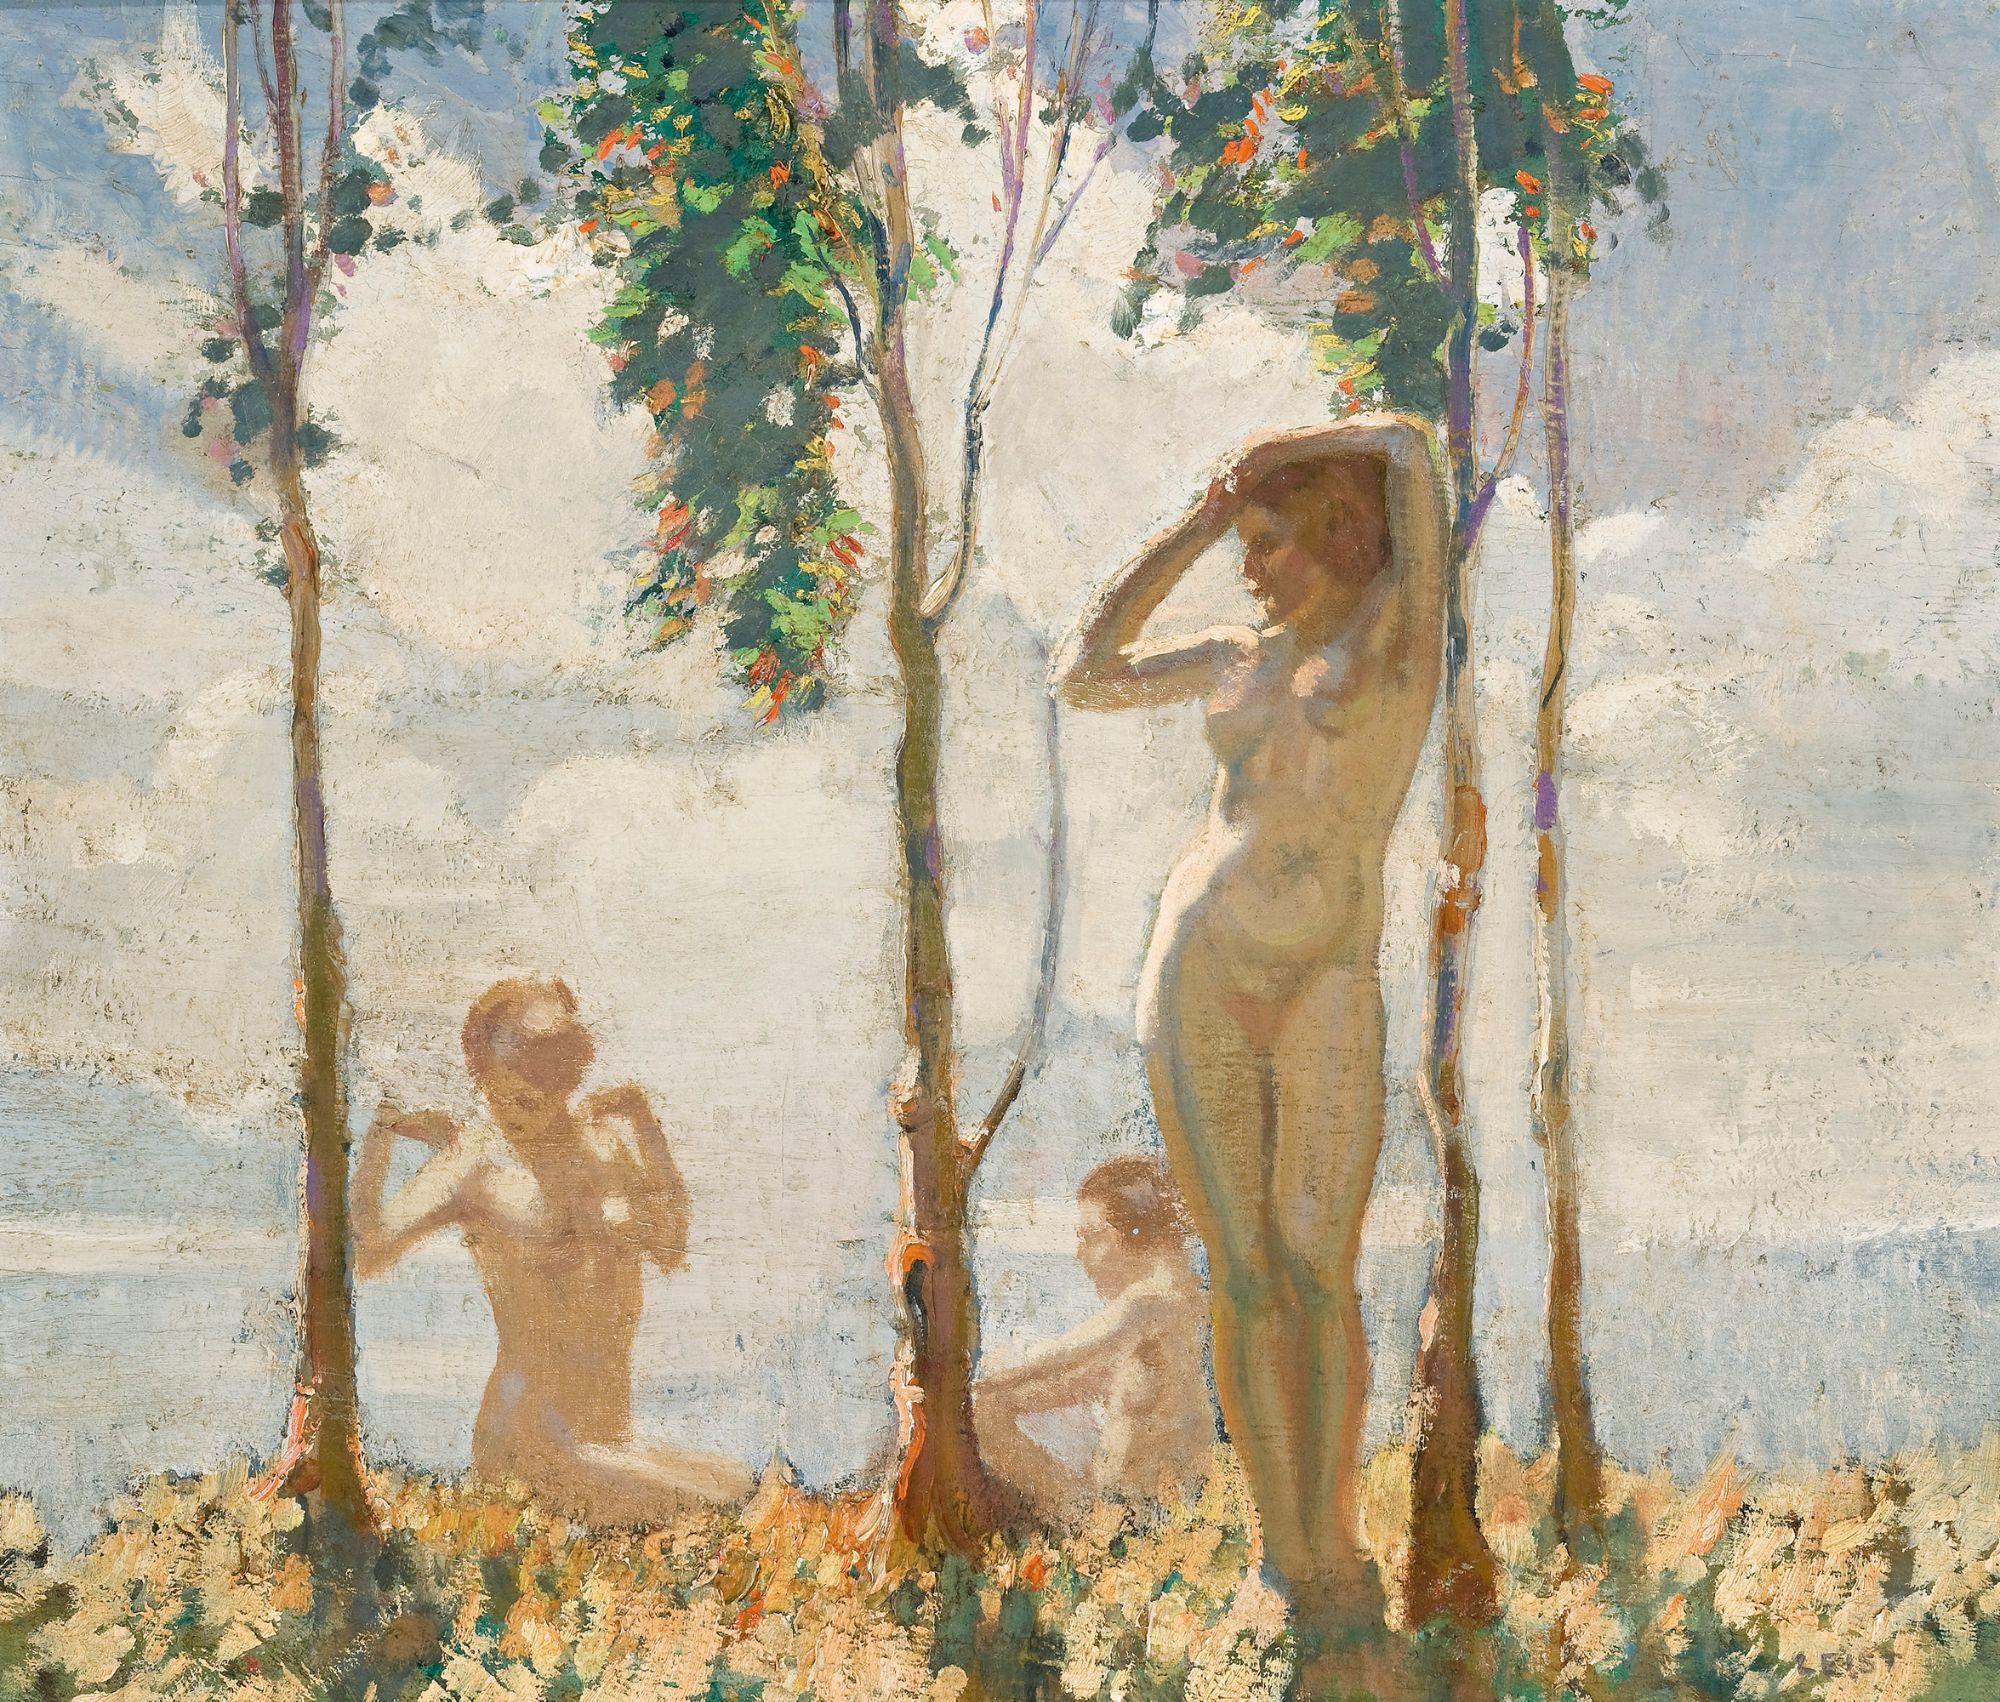 Fred Leist, 1878-1945. Три нимфы. 35.2 х 42 см. Частная коллекция